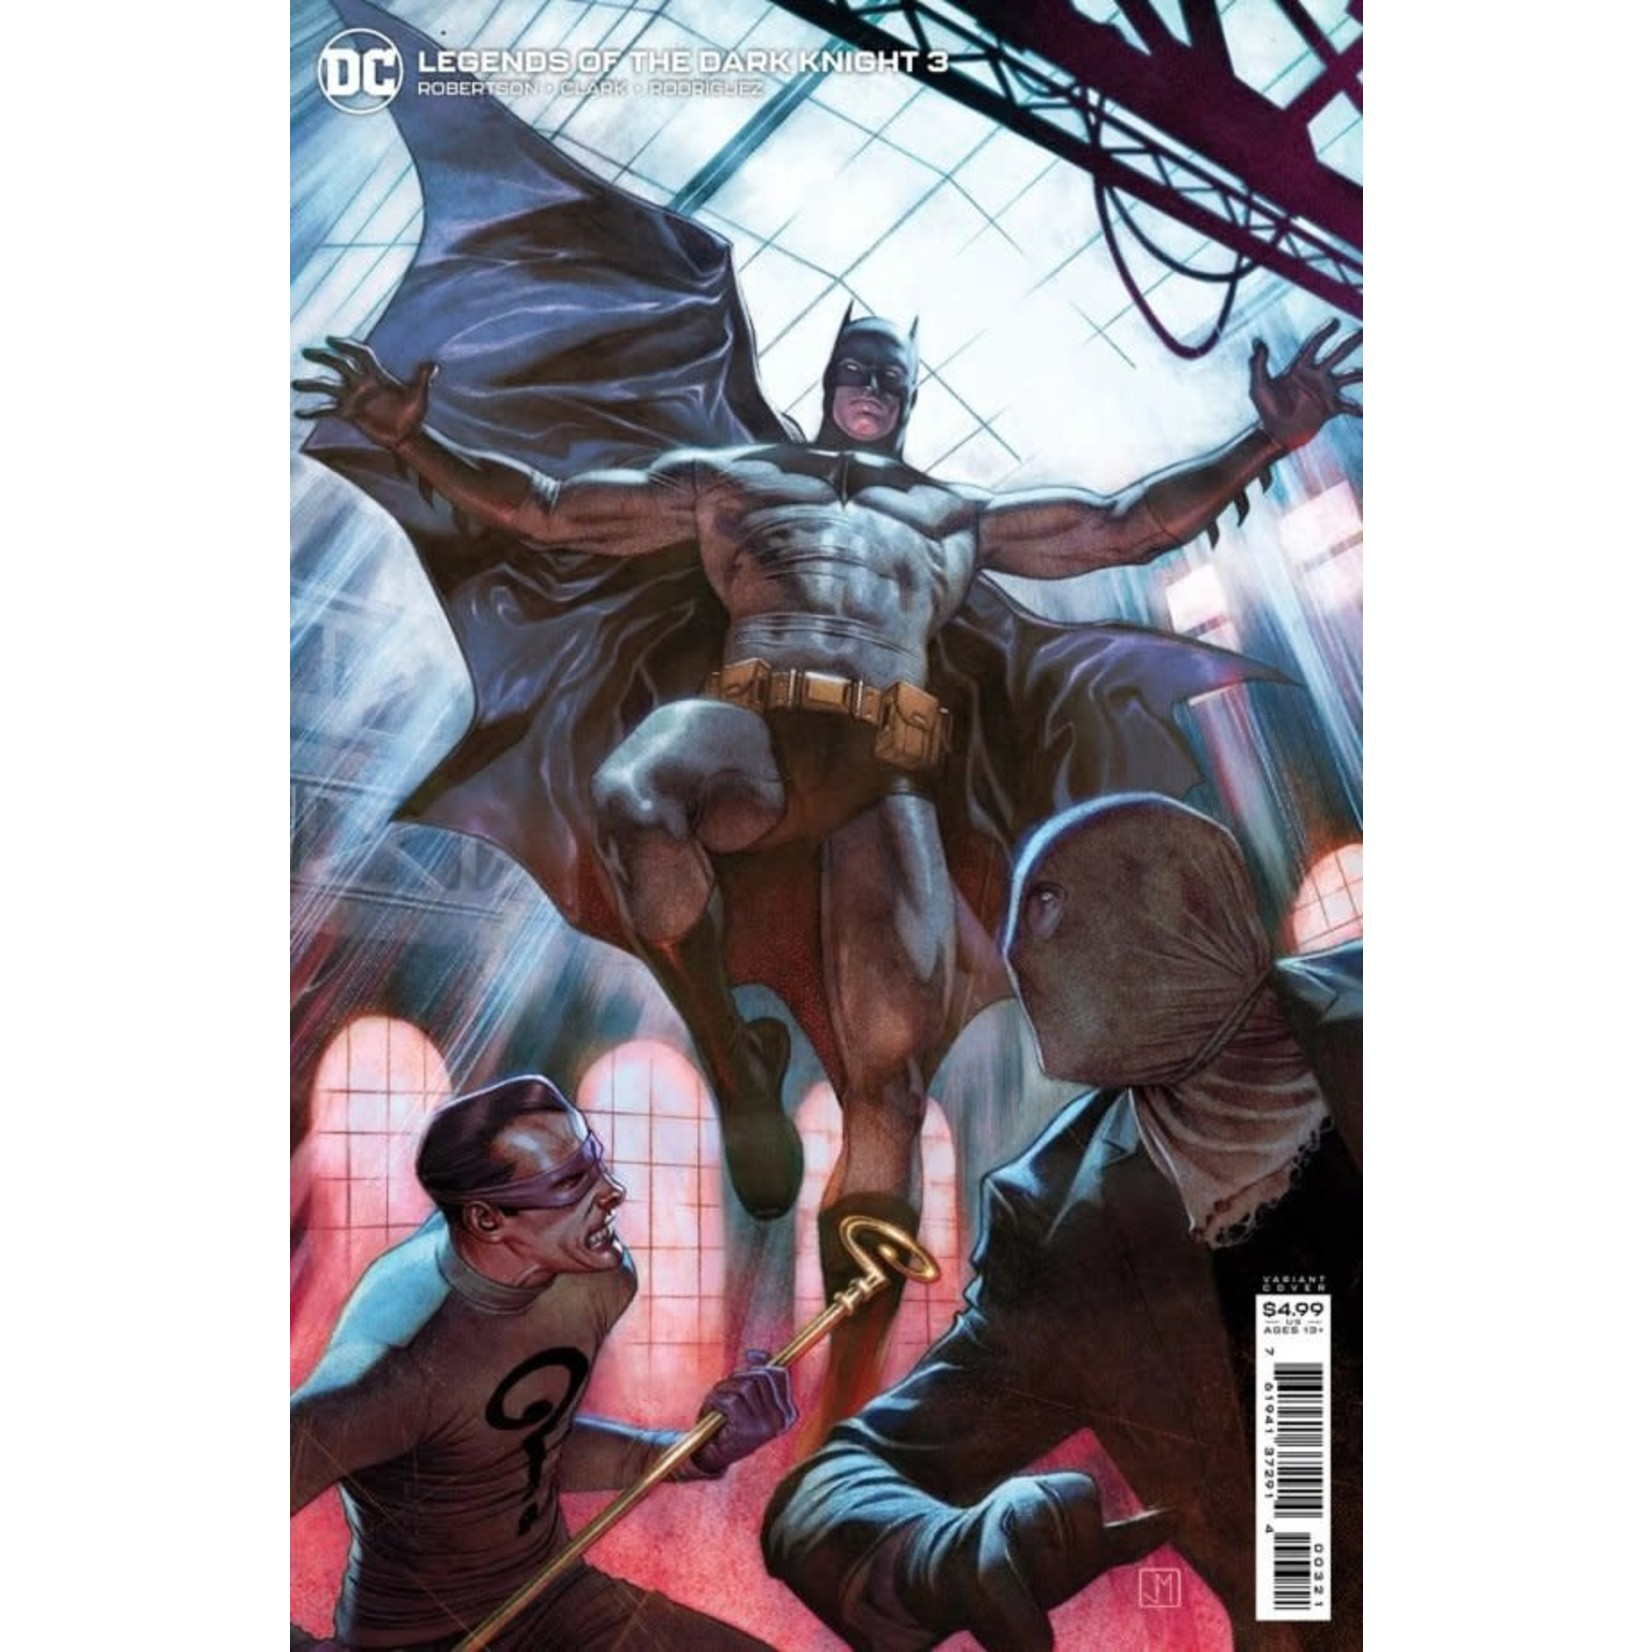 DC Comics Legends of the dark knight #3 Var